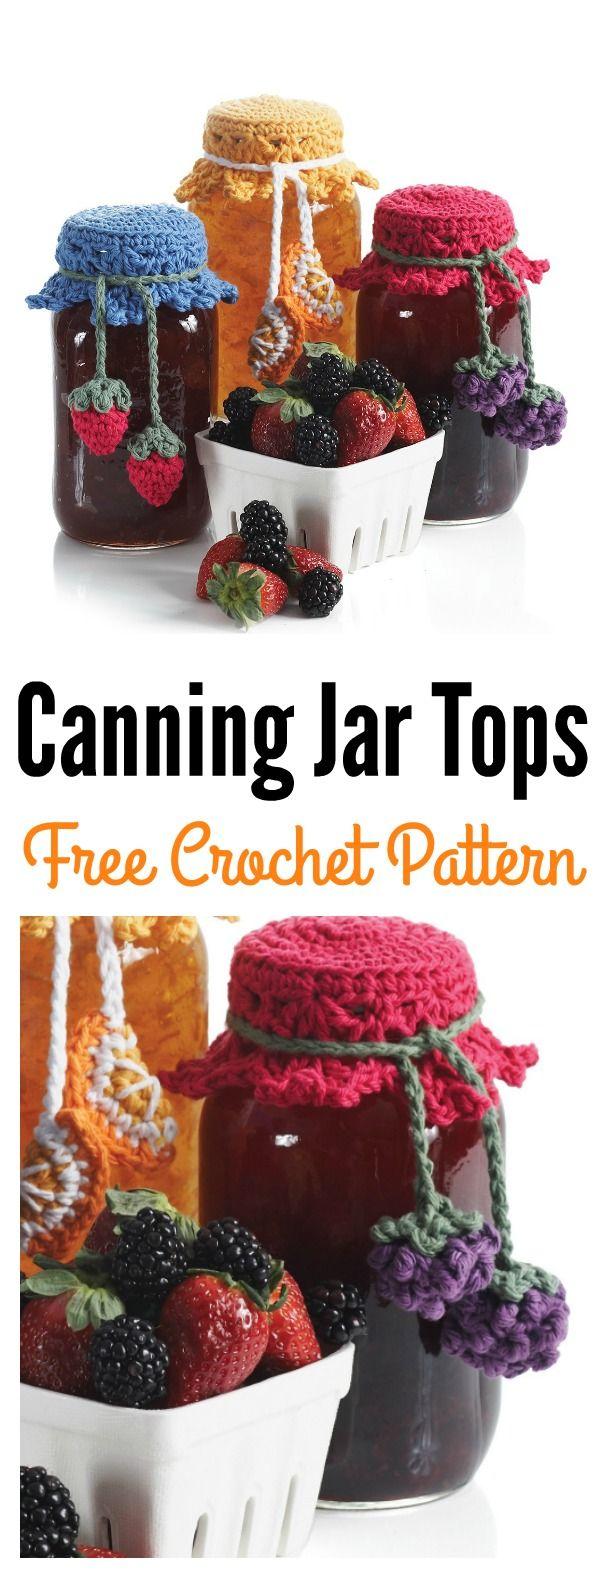 Canning Jar Tops Free Crochet Pattern